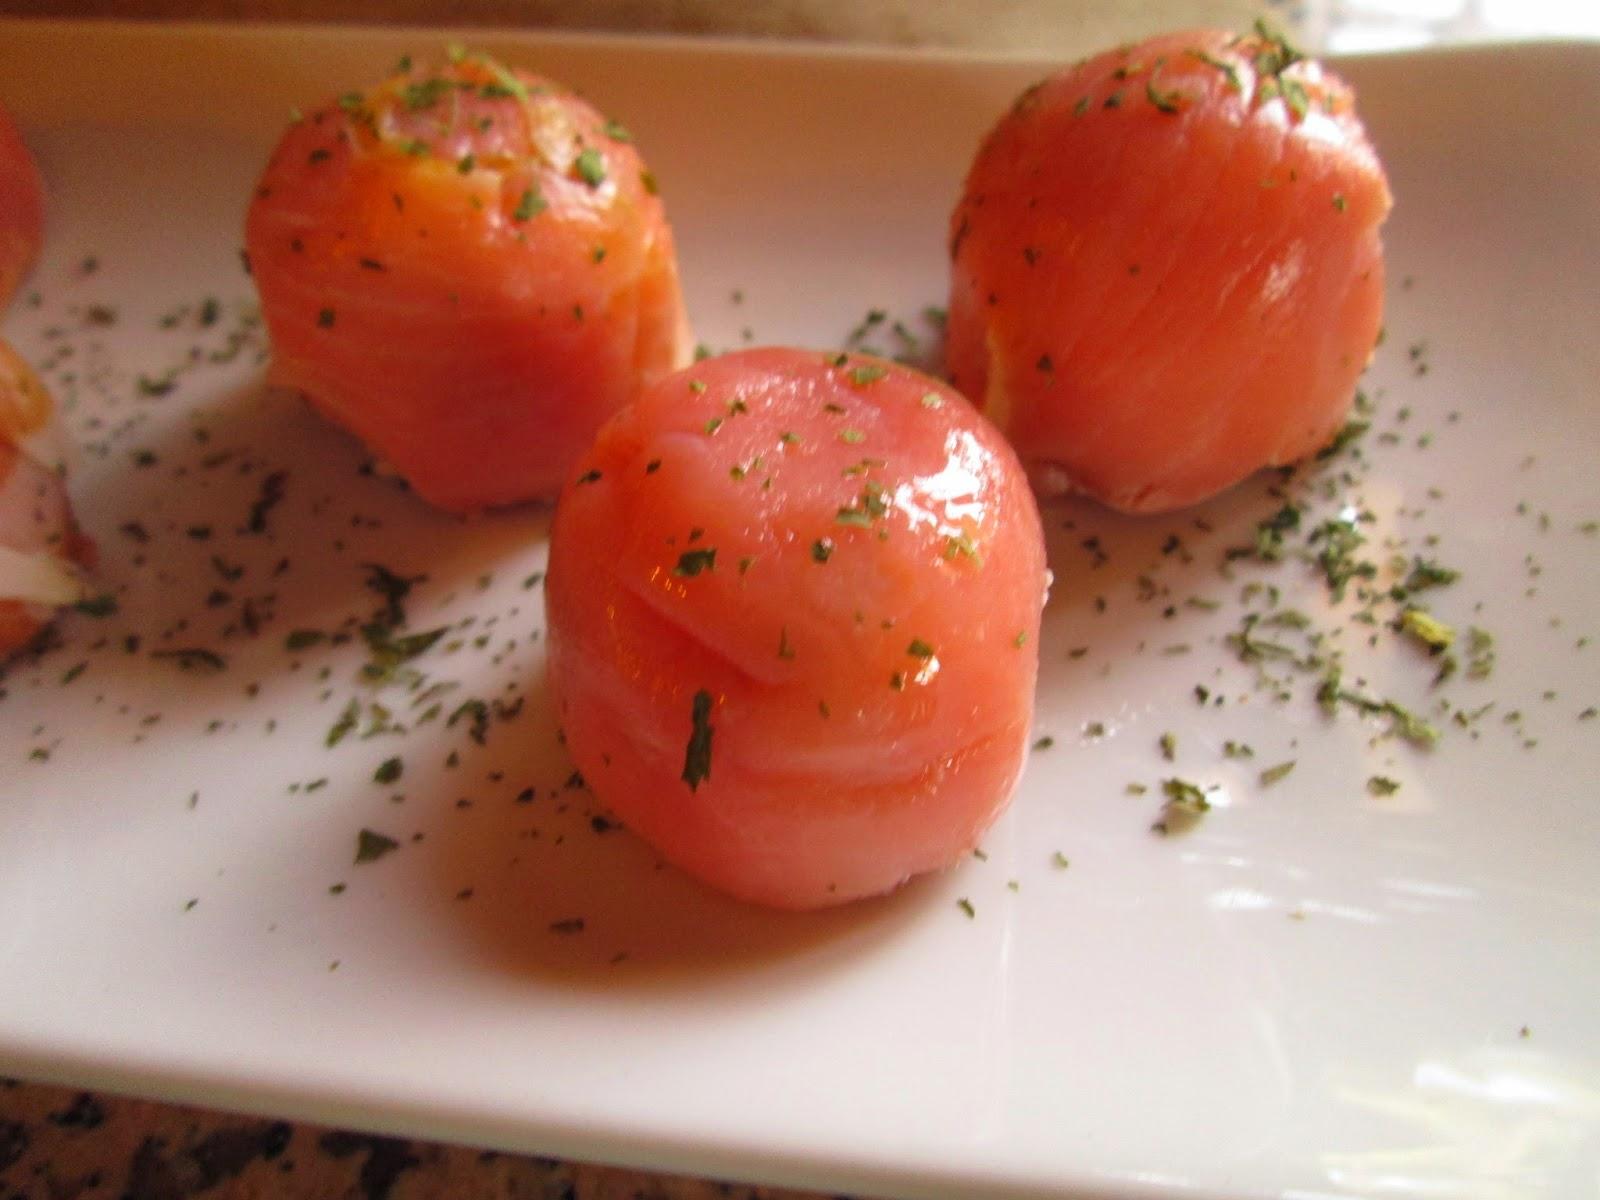 La cuisine de paqui aperitivos bombones de salm n jam n - Aperitivos de salmon ahumado ...